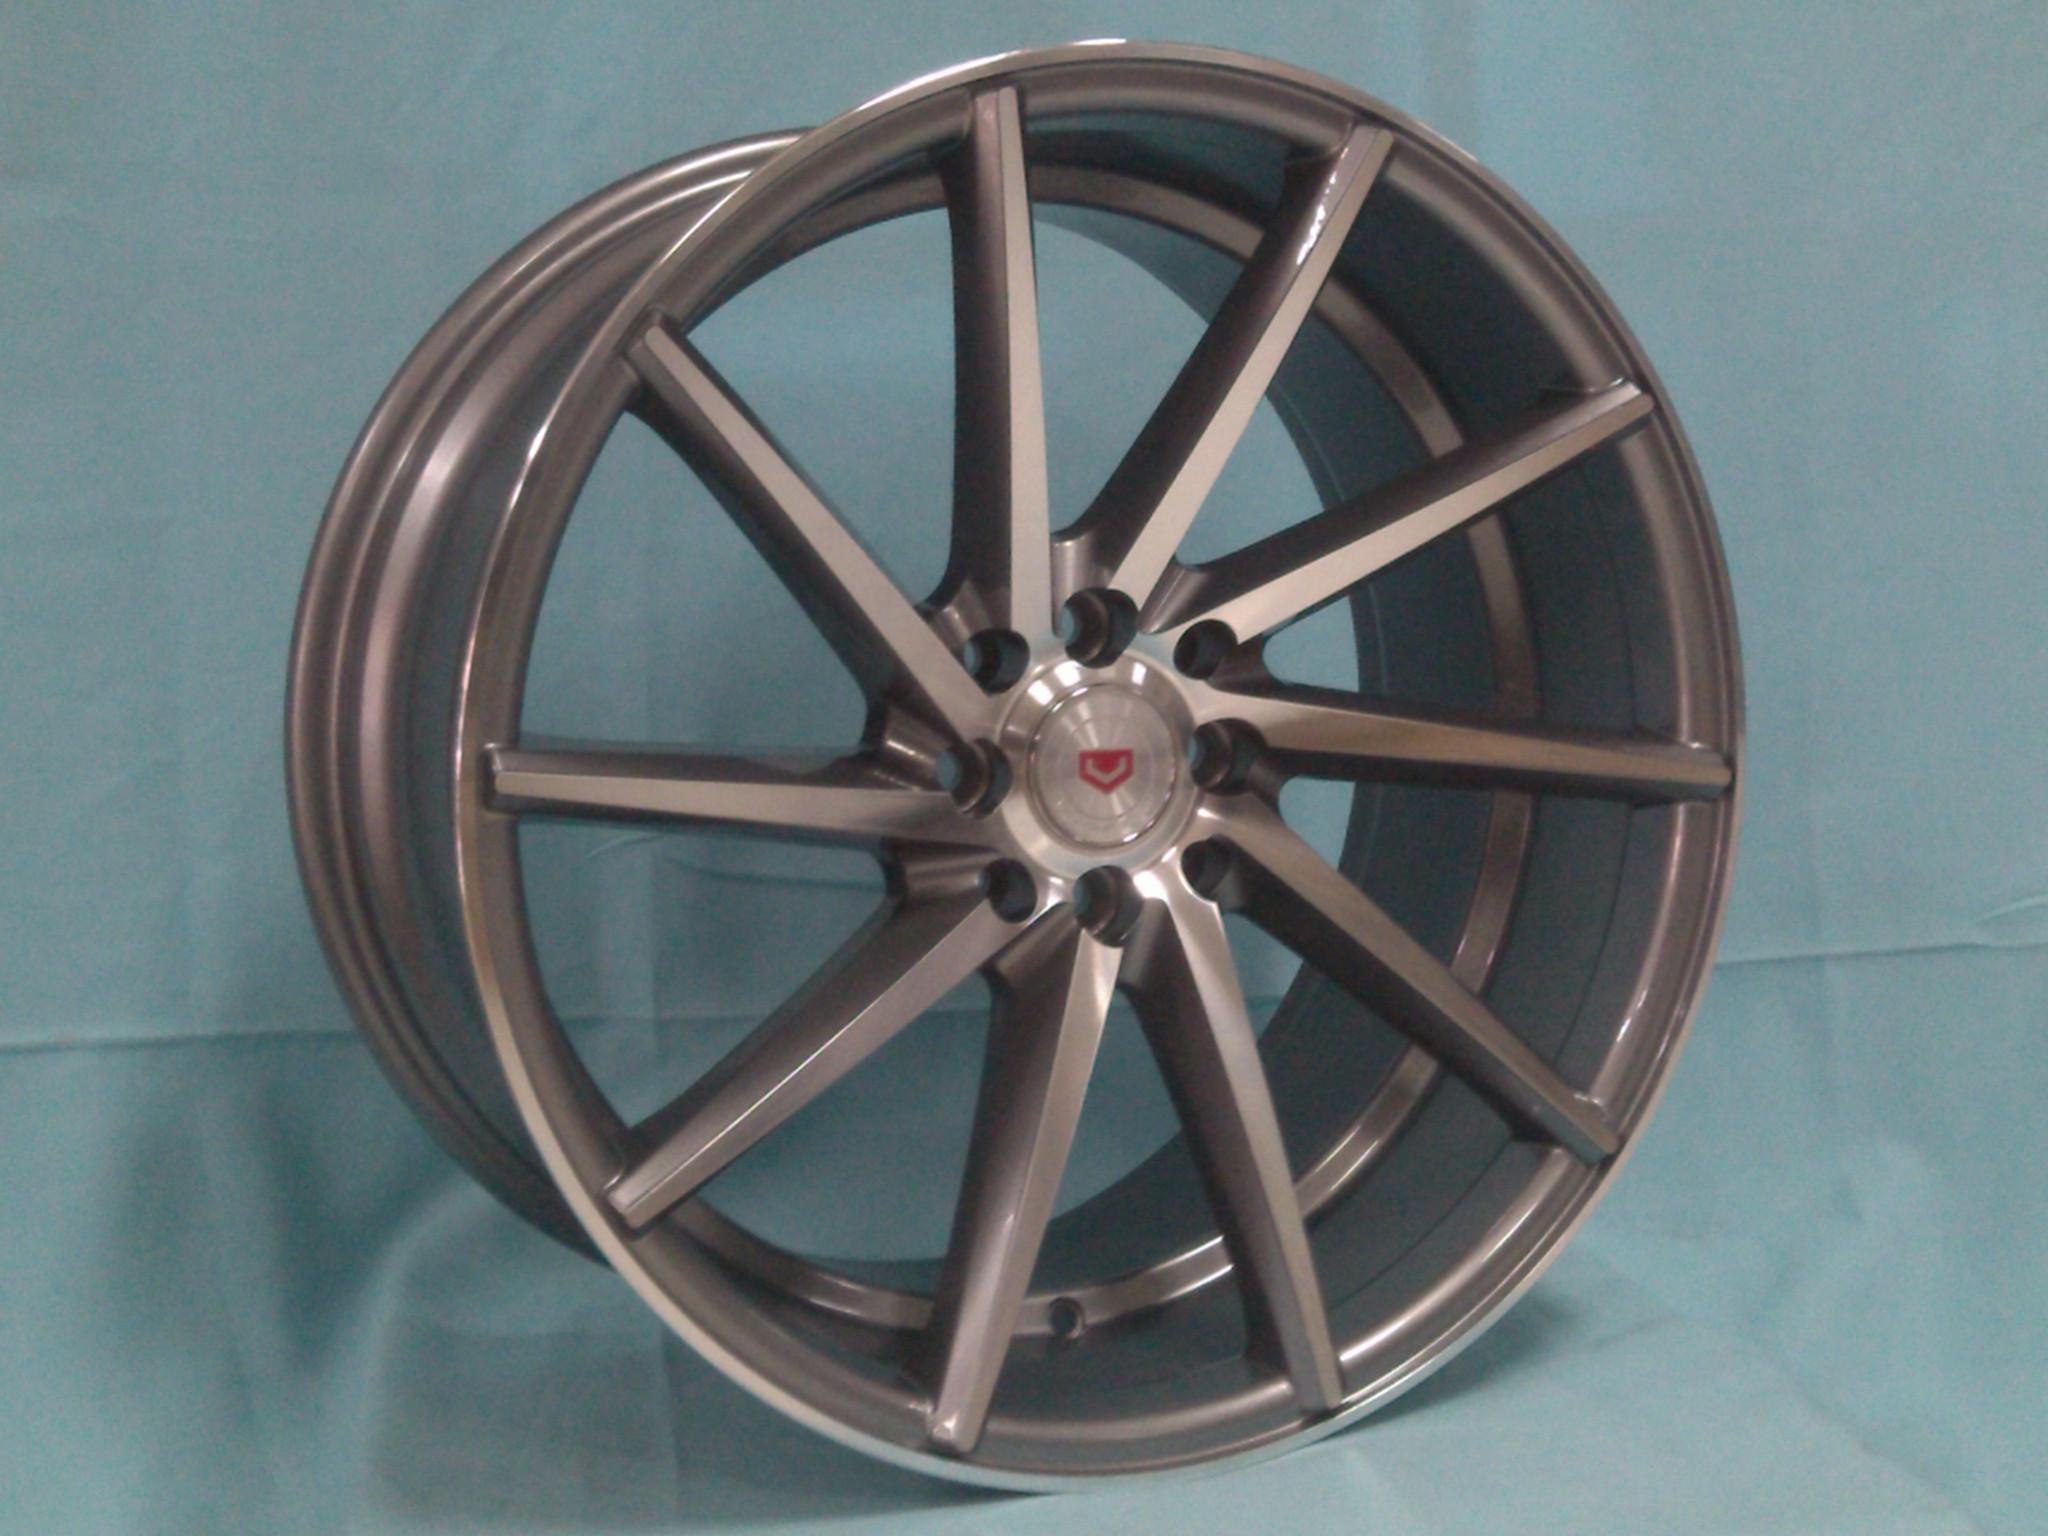 harga Velg CVT (fla43) F-R 18x8-9 8x100-114,3 (42-38) Tokopedia.com